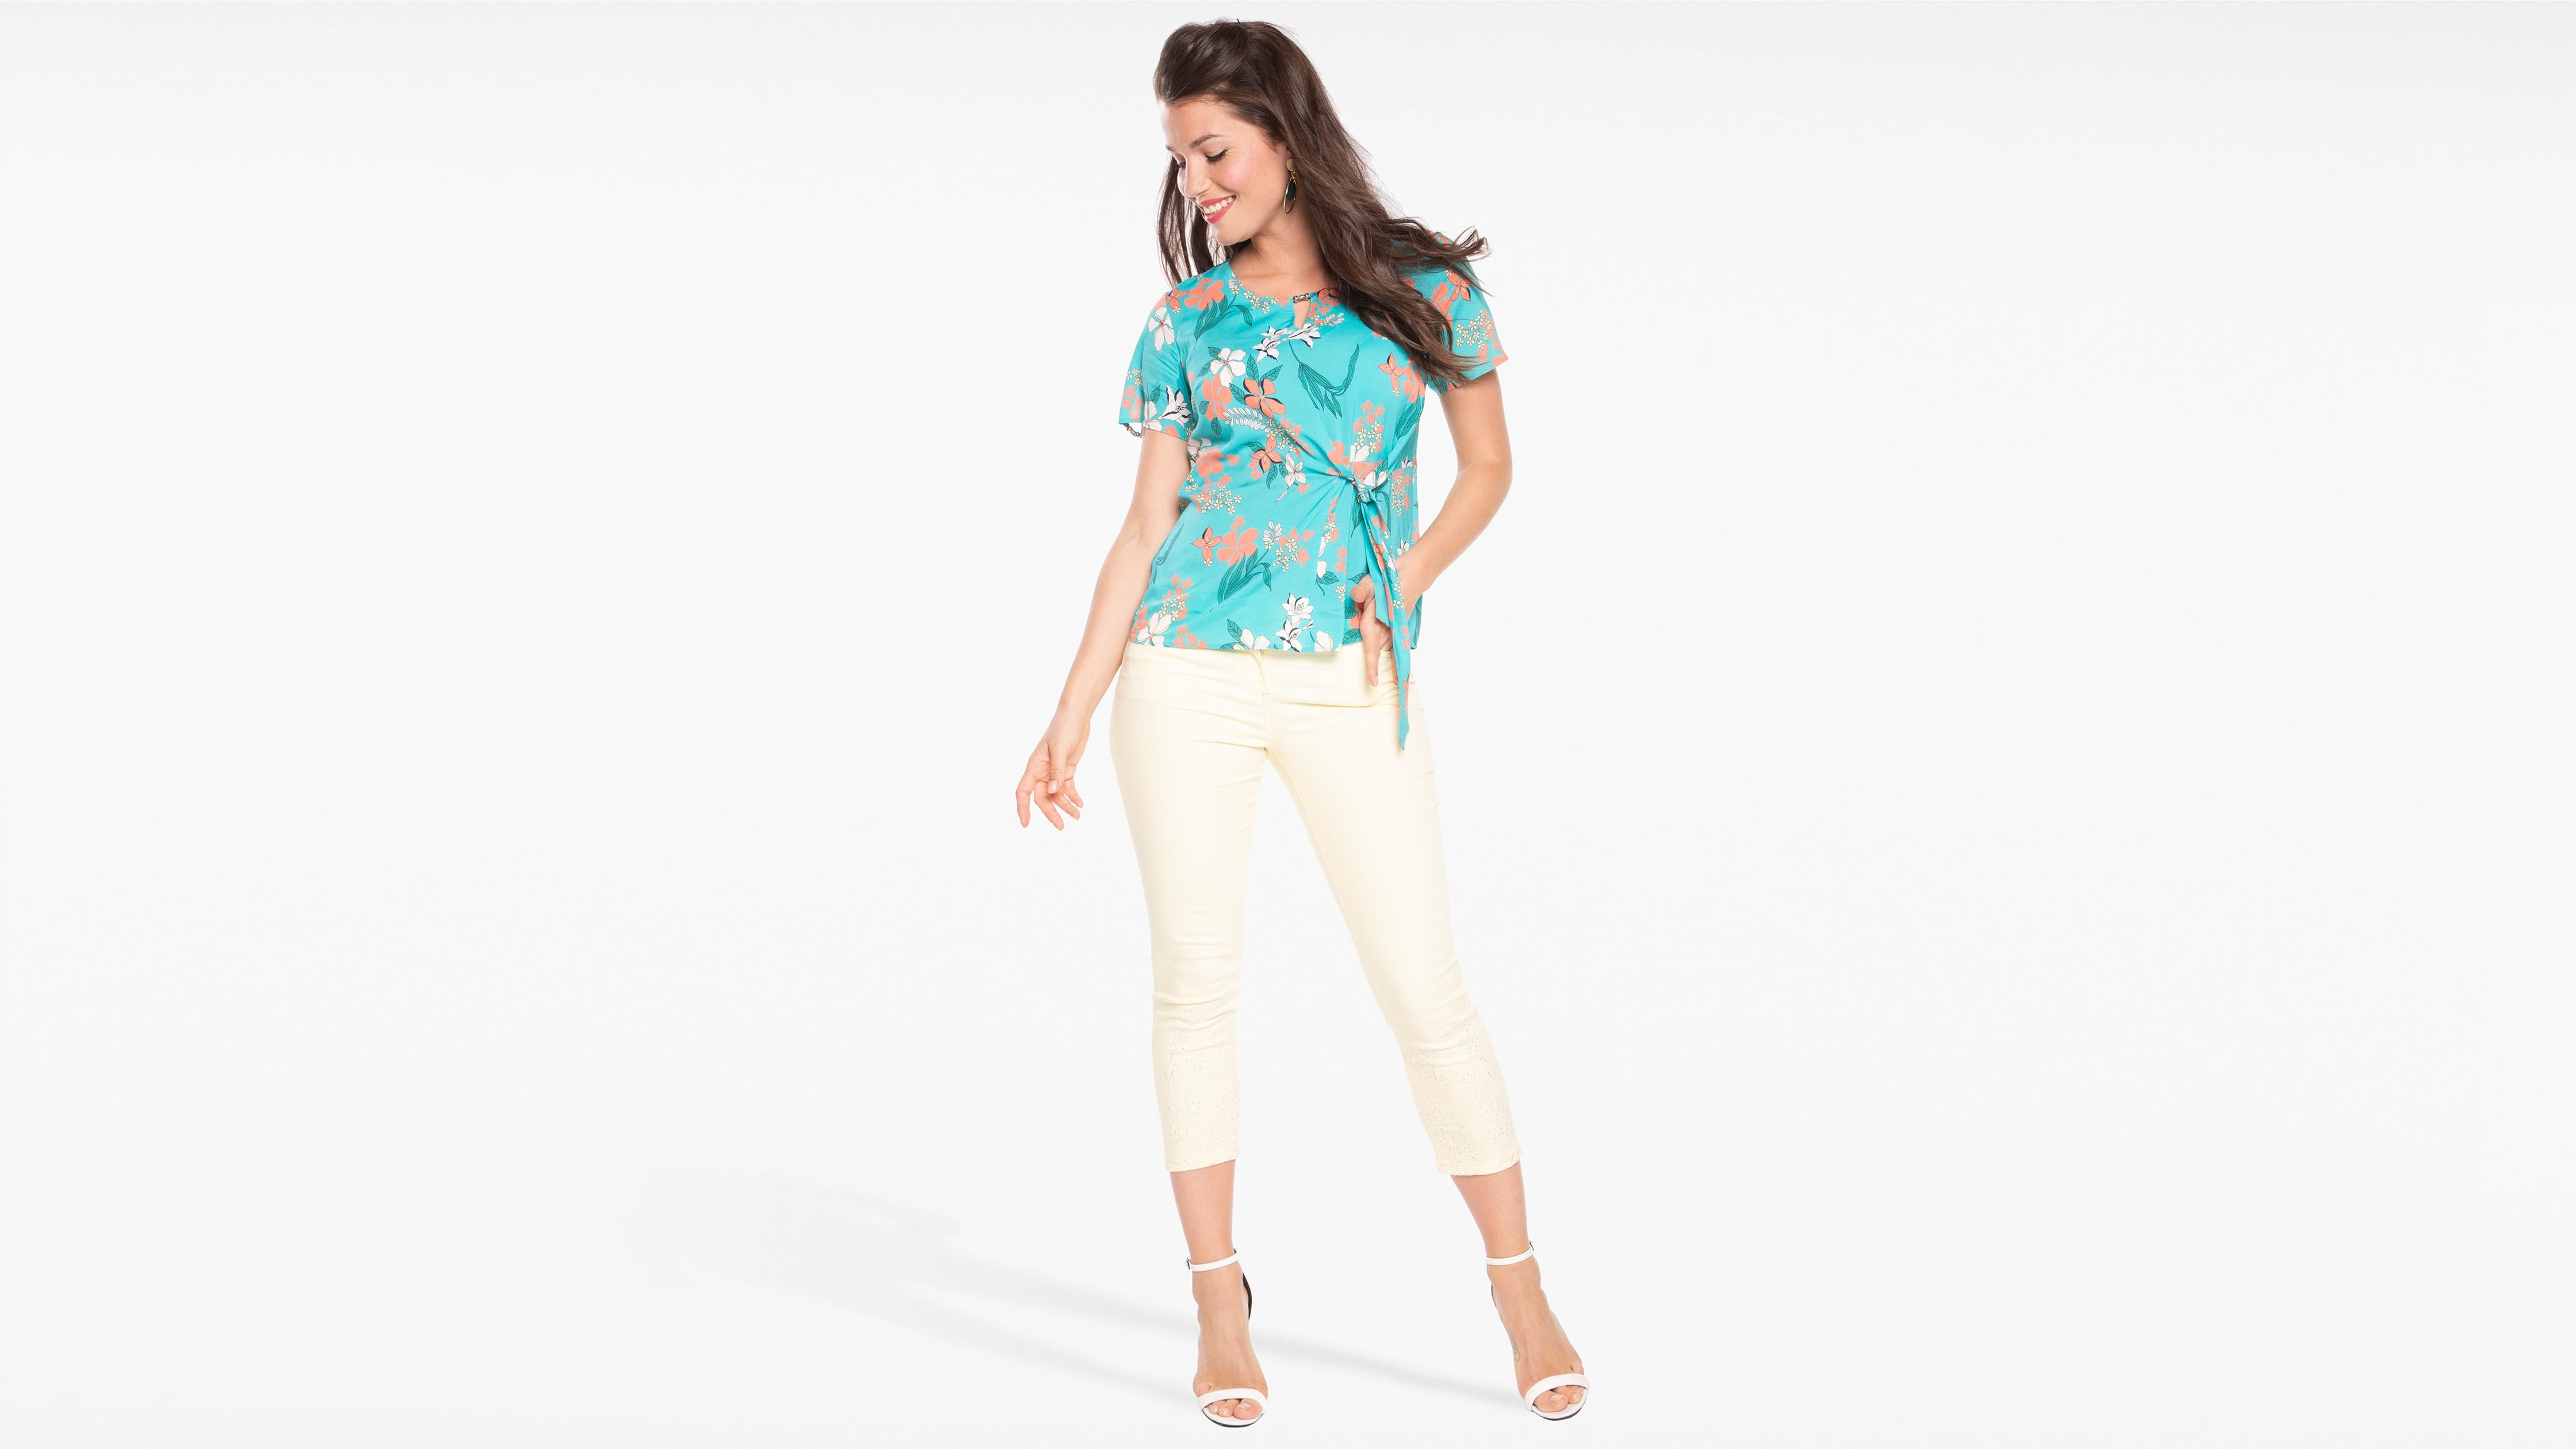 turquesa para mujer de corta verde Camisa manga thCxsQrd